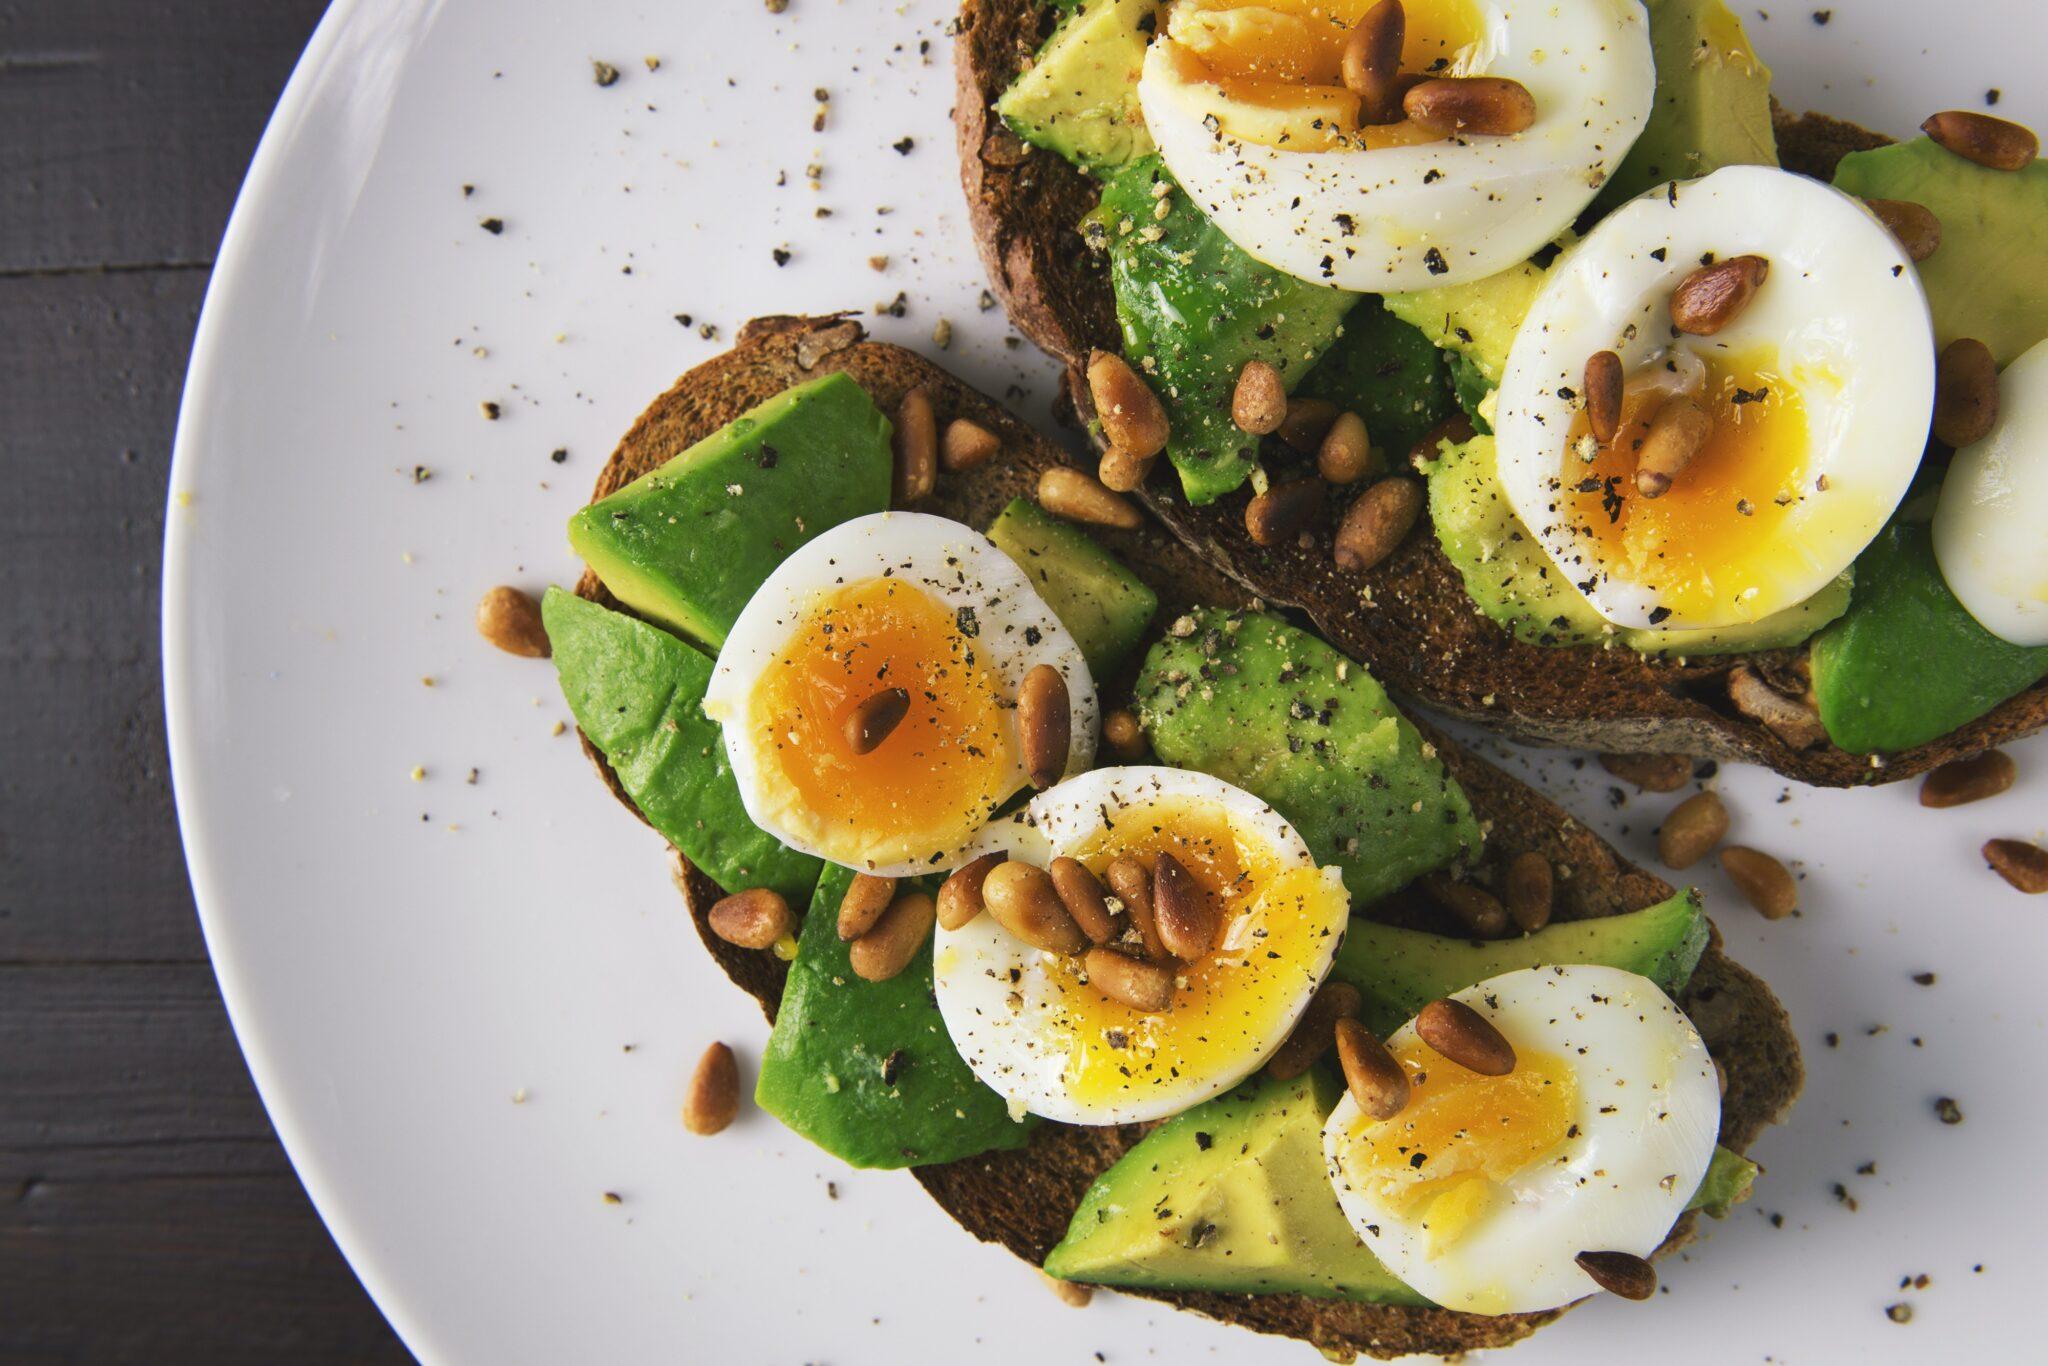 avocado meal for pregant women